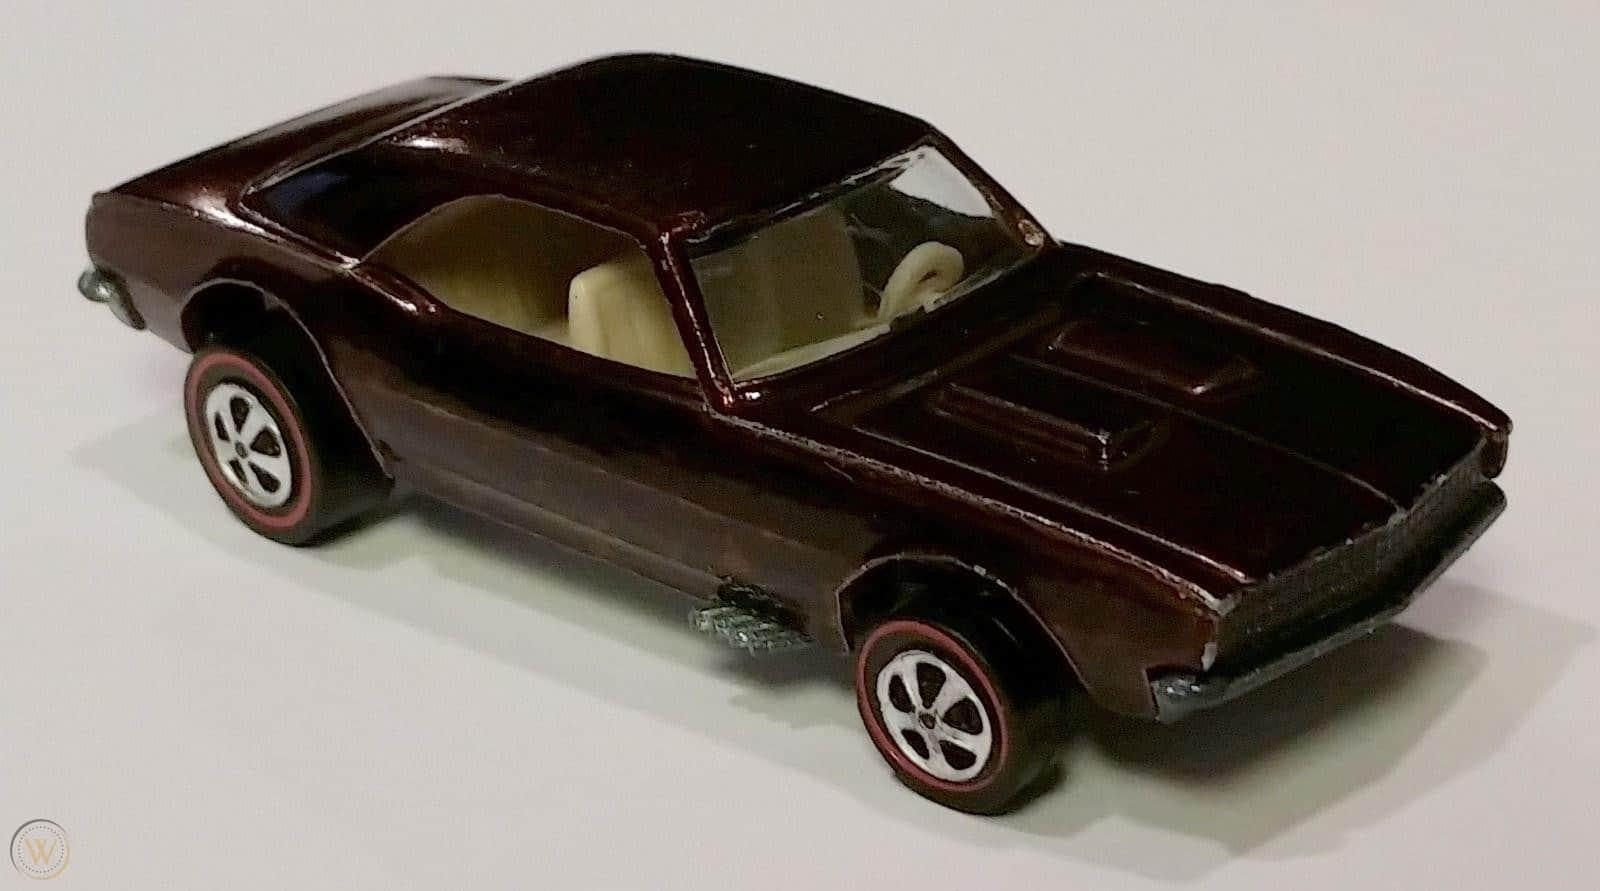 Custom Camaro In Brown From 1968 $3,000